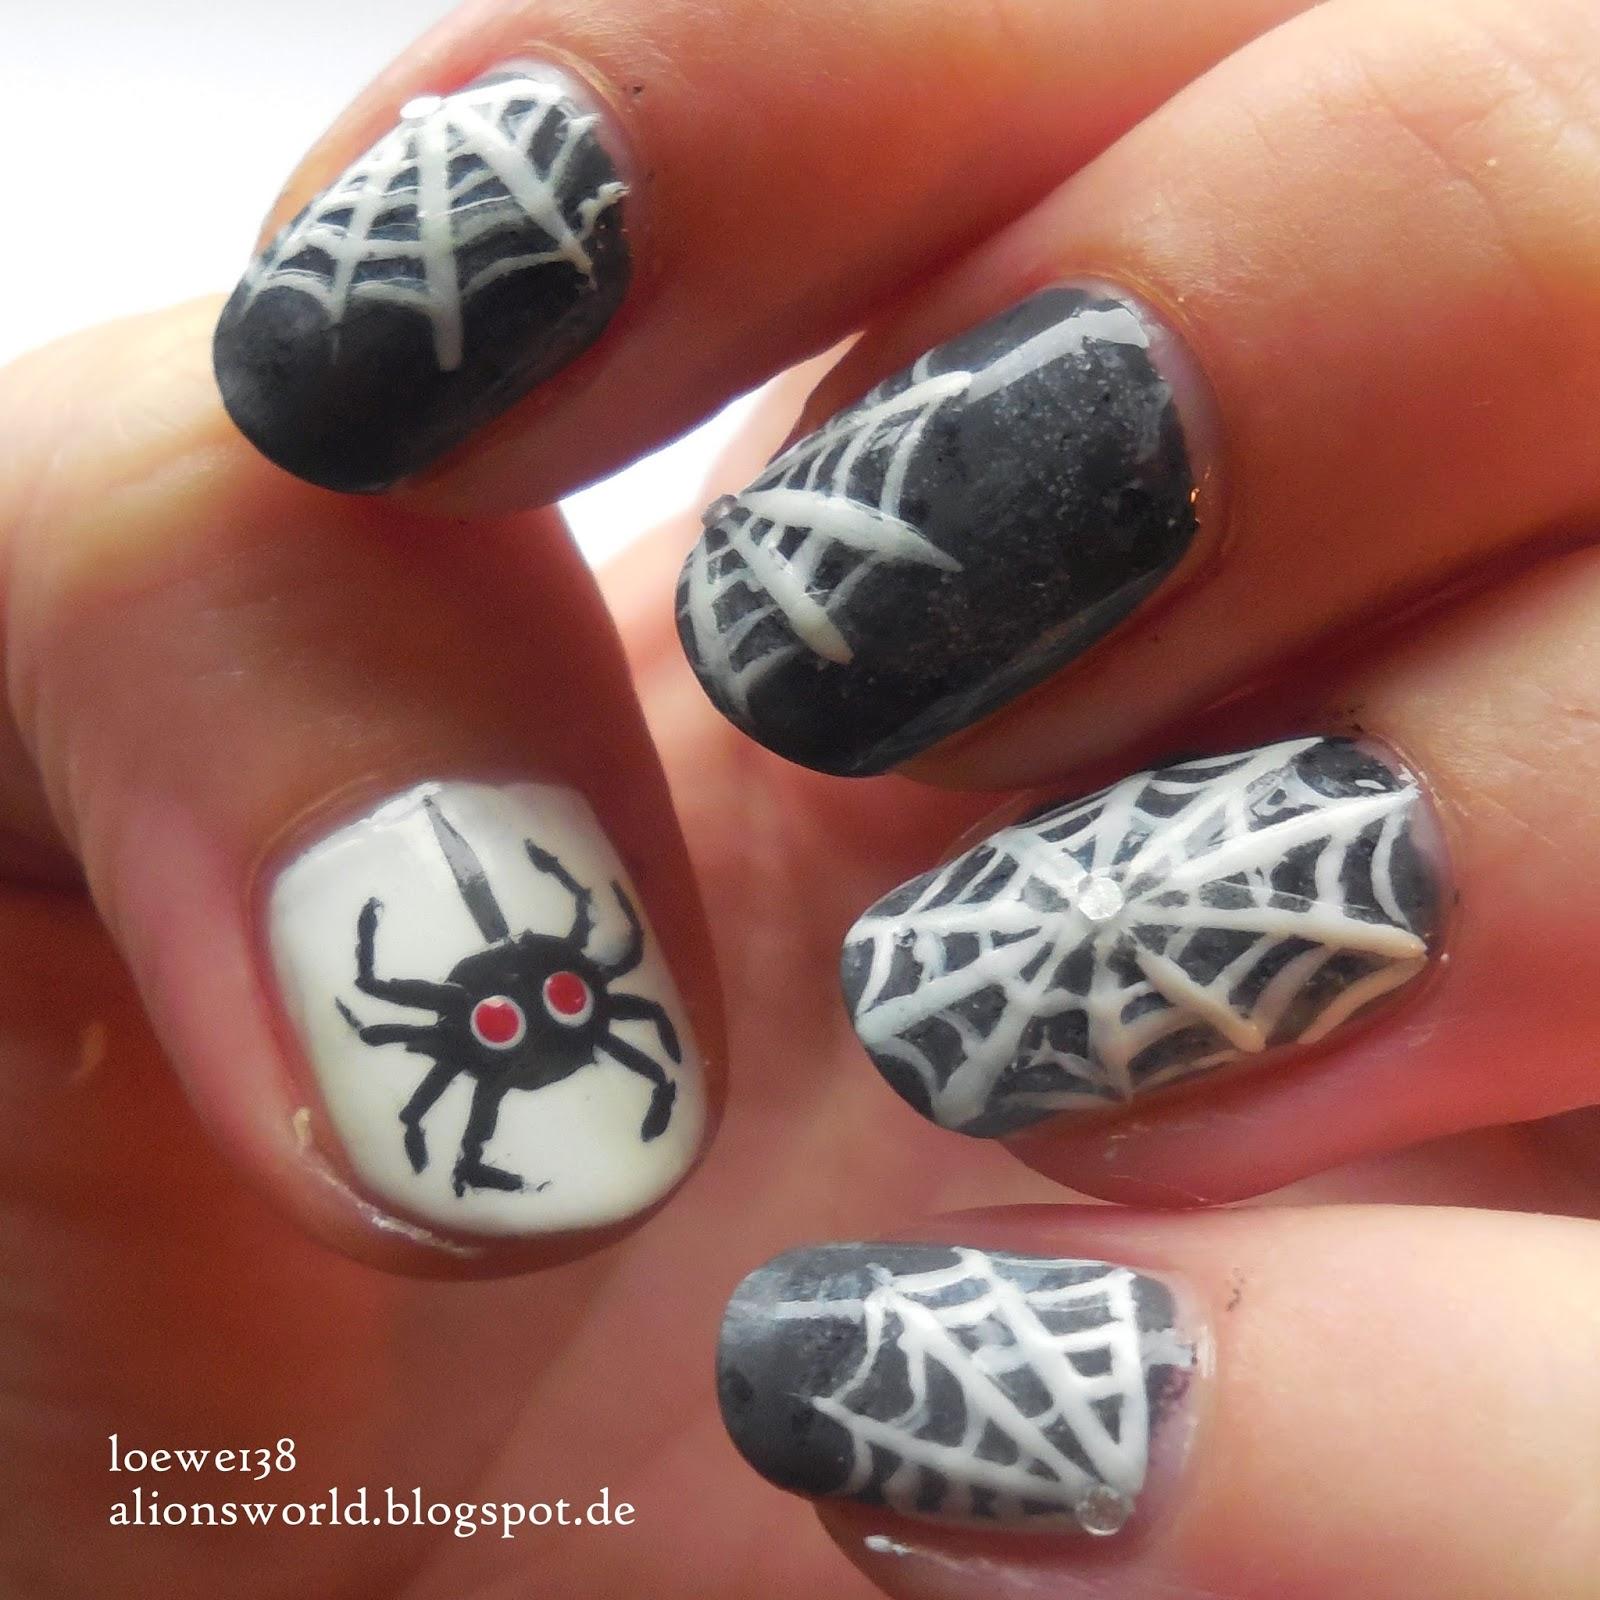 http://alionsworld.blogspot.com/2014/10/itsy-bitsy-spider-frischlackiertchallen.html